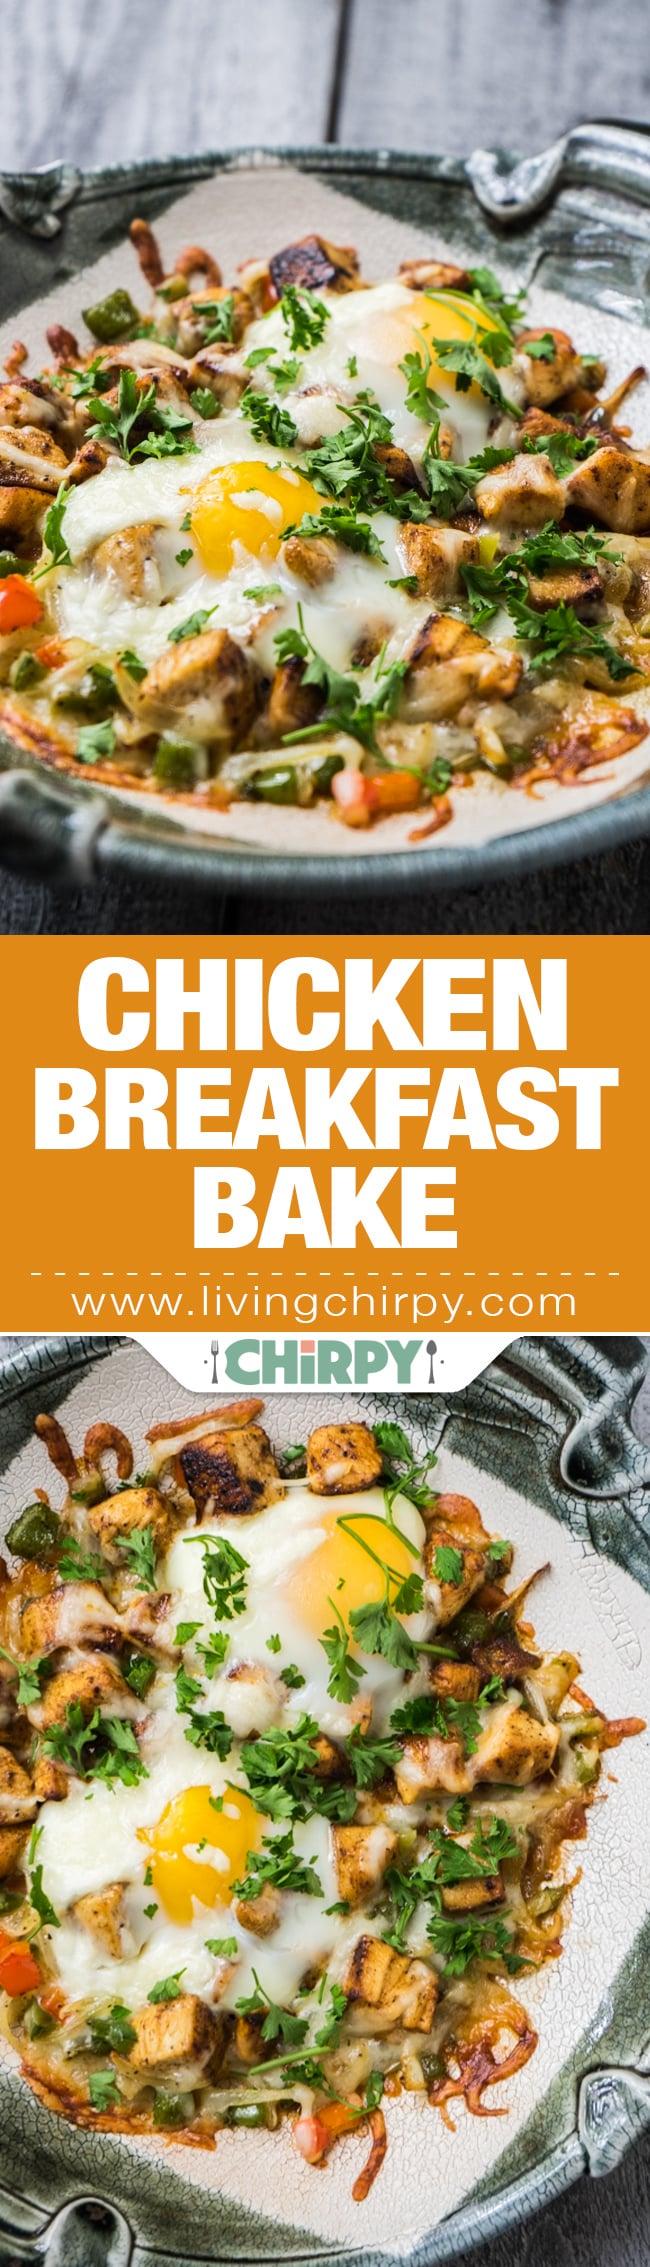 chicken-breakfast-bake-pin 3